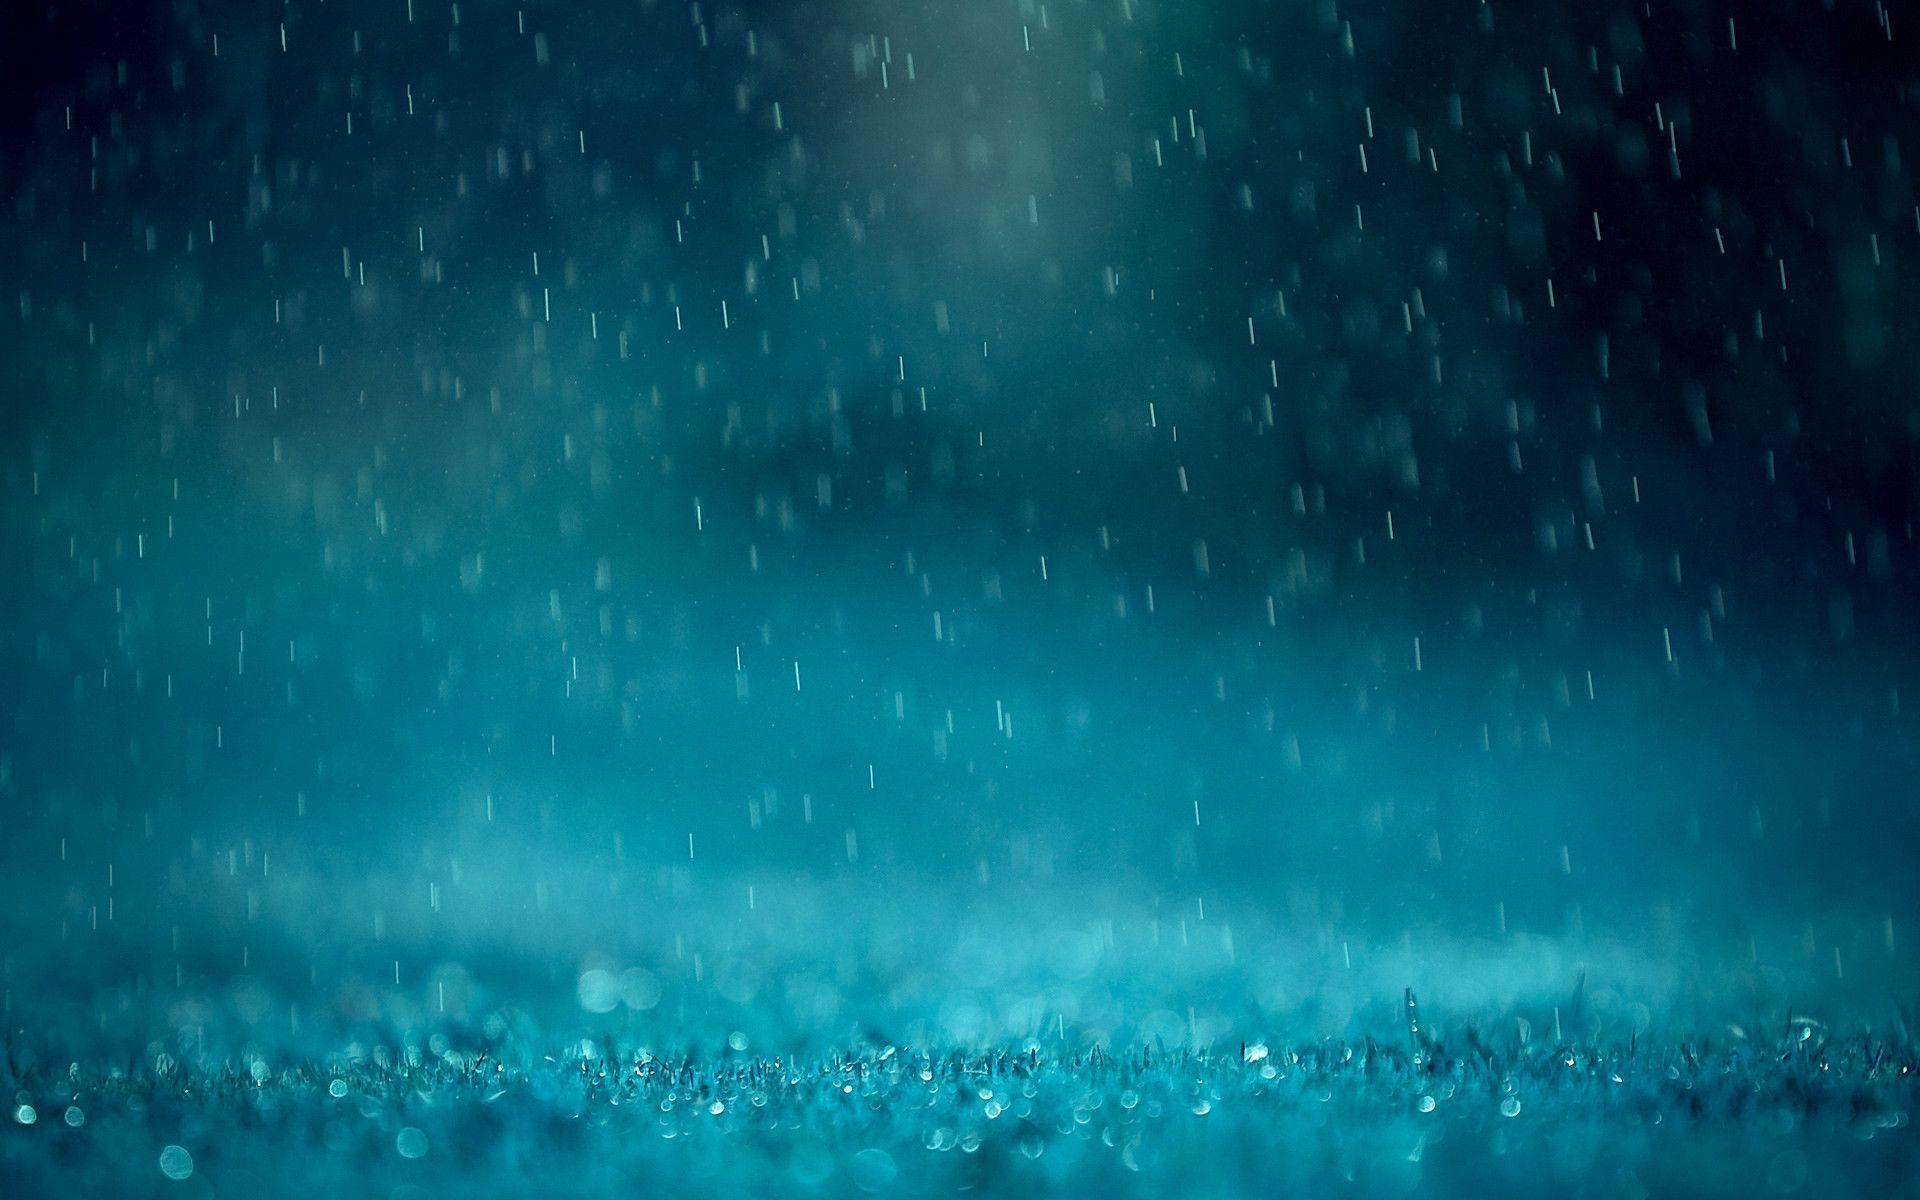 Hd wallpaper rain - Rain Wallpaper Youtube